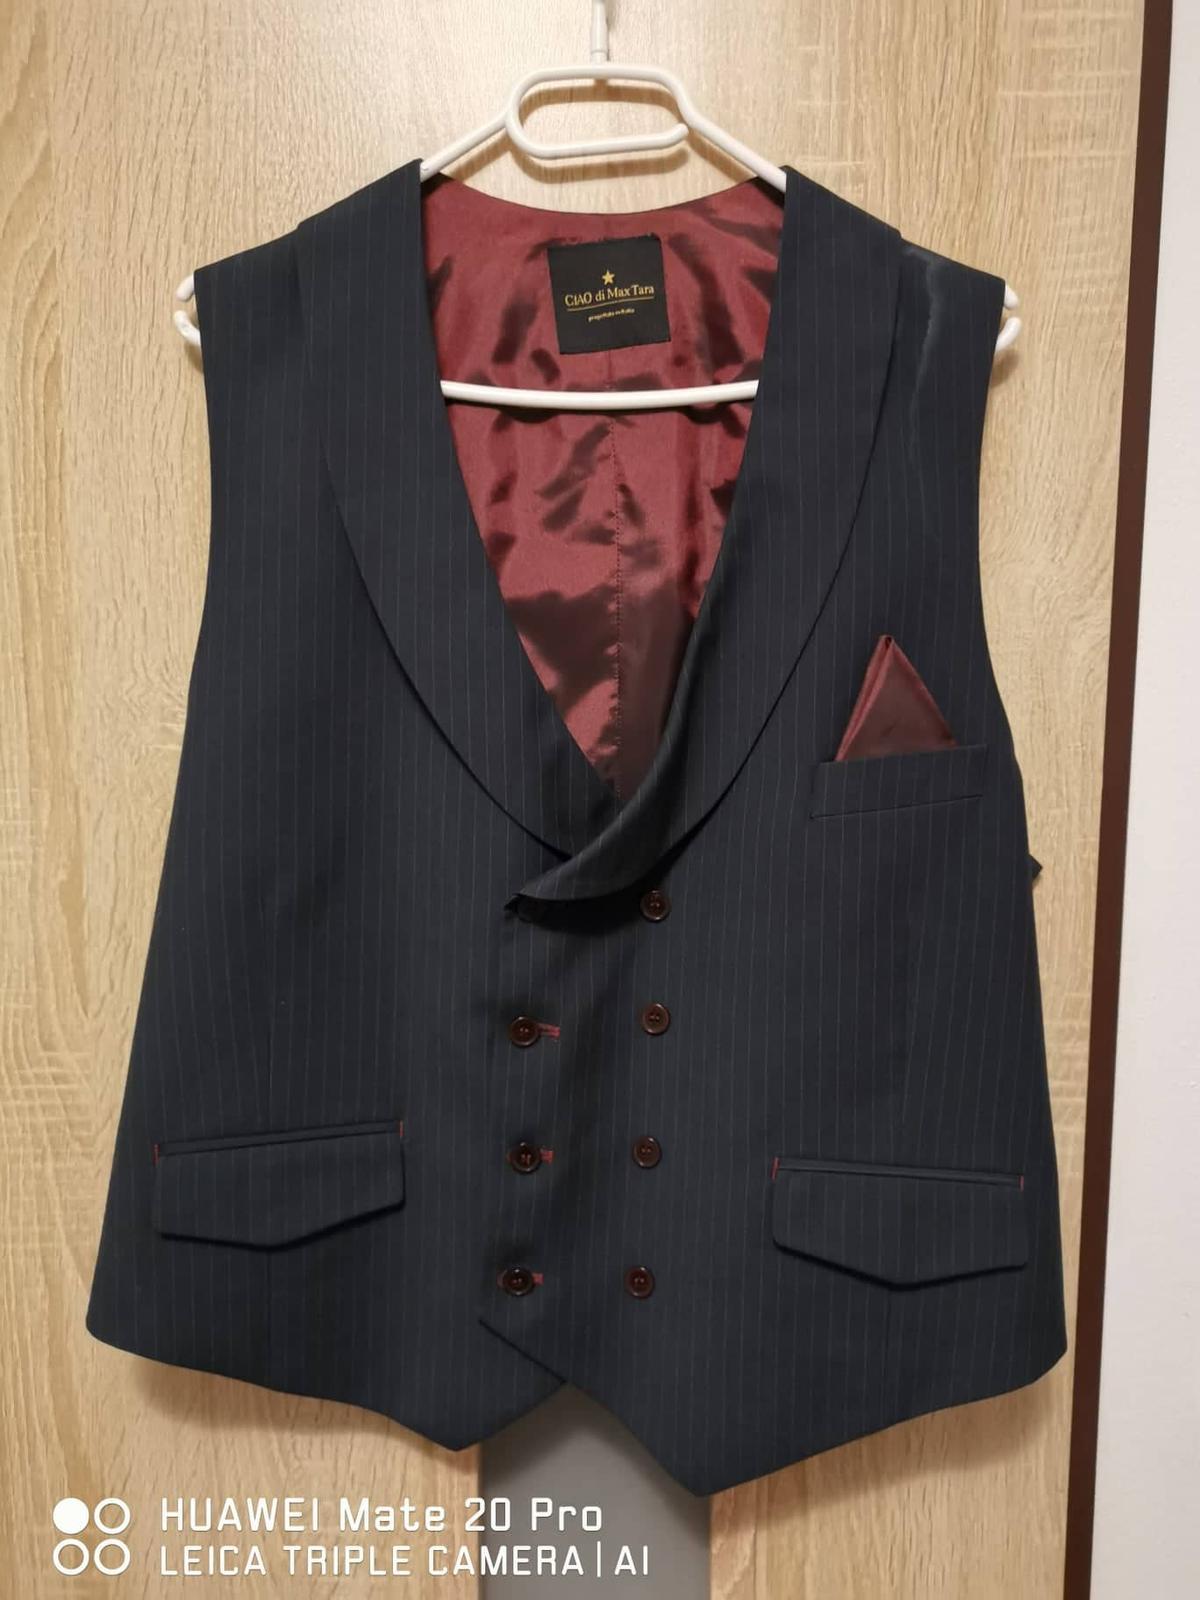 Pánský oblek  CiAO di MaxTara - Obrázek č. 4